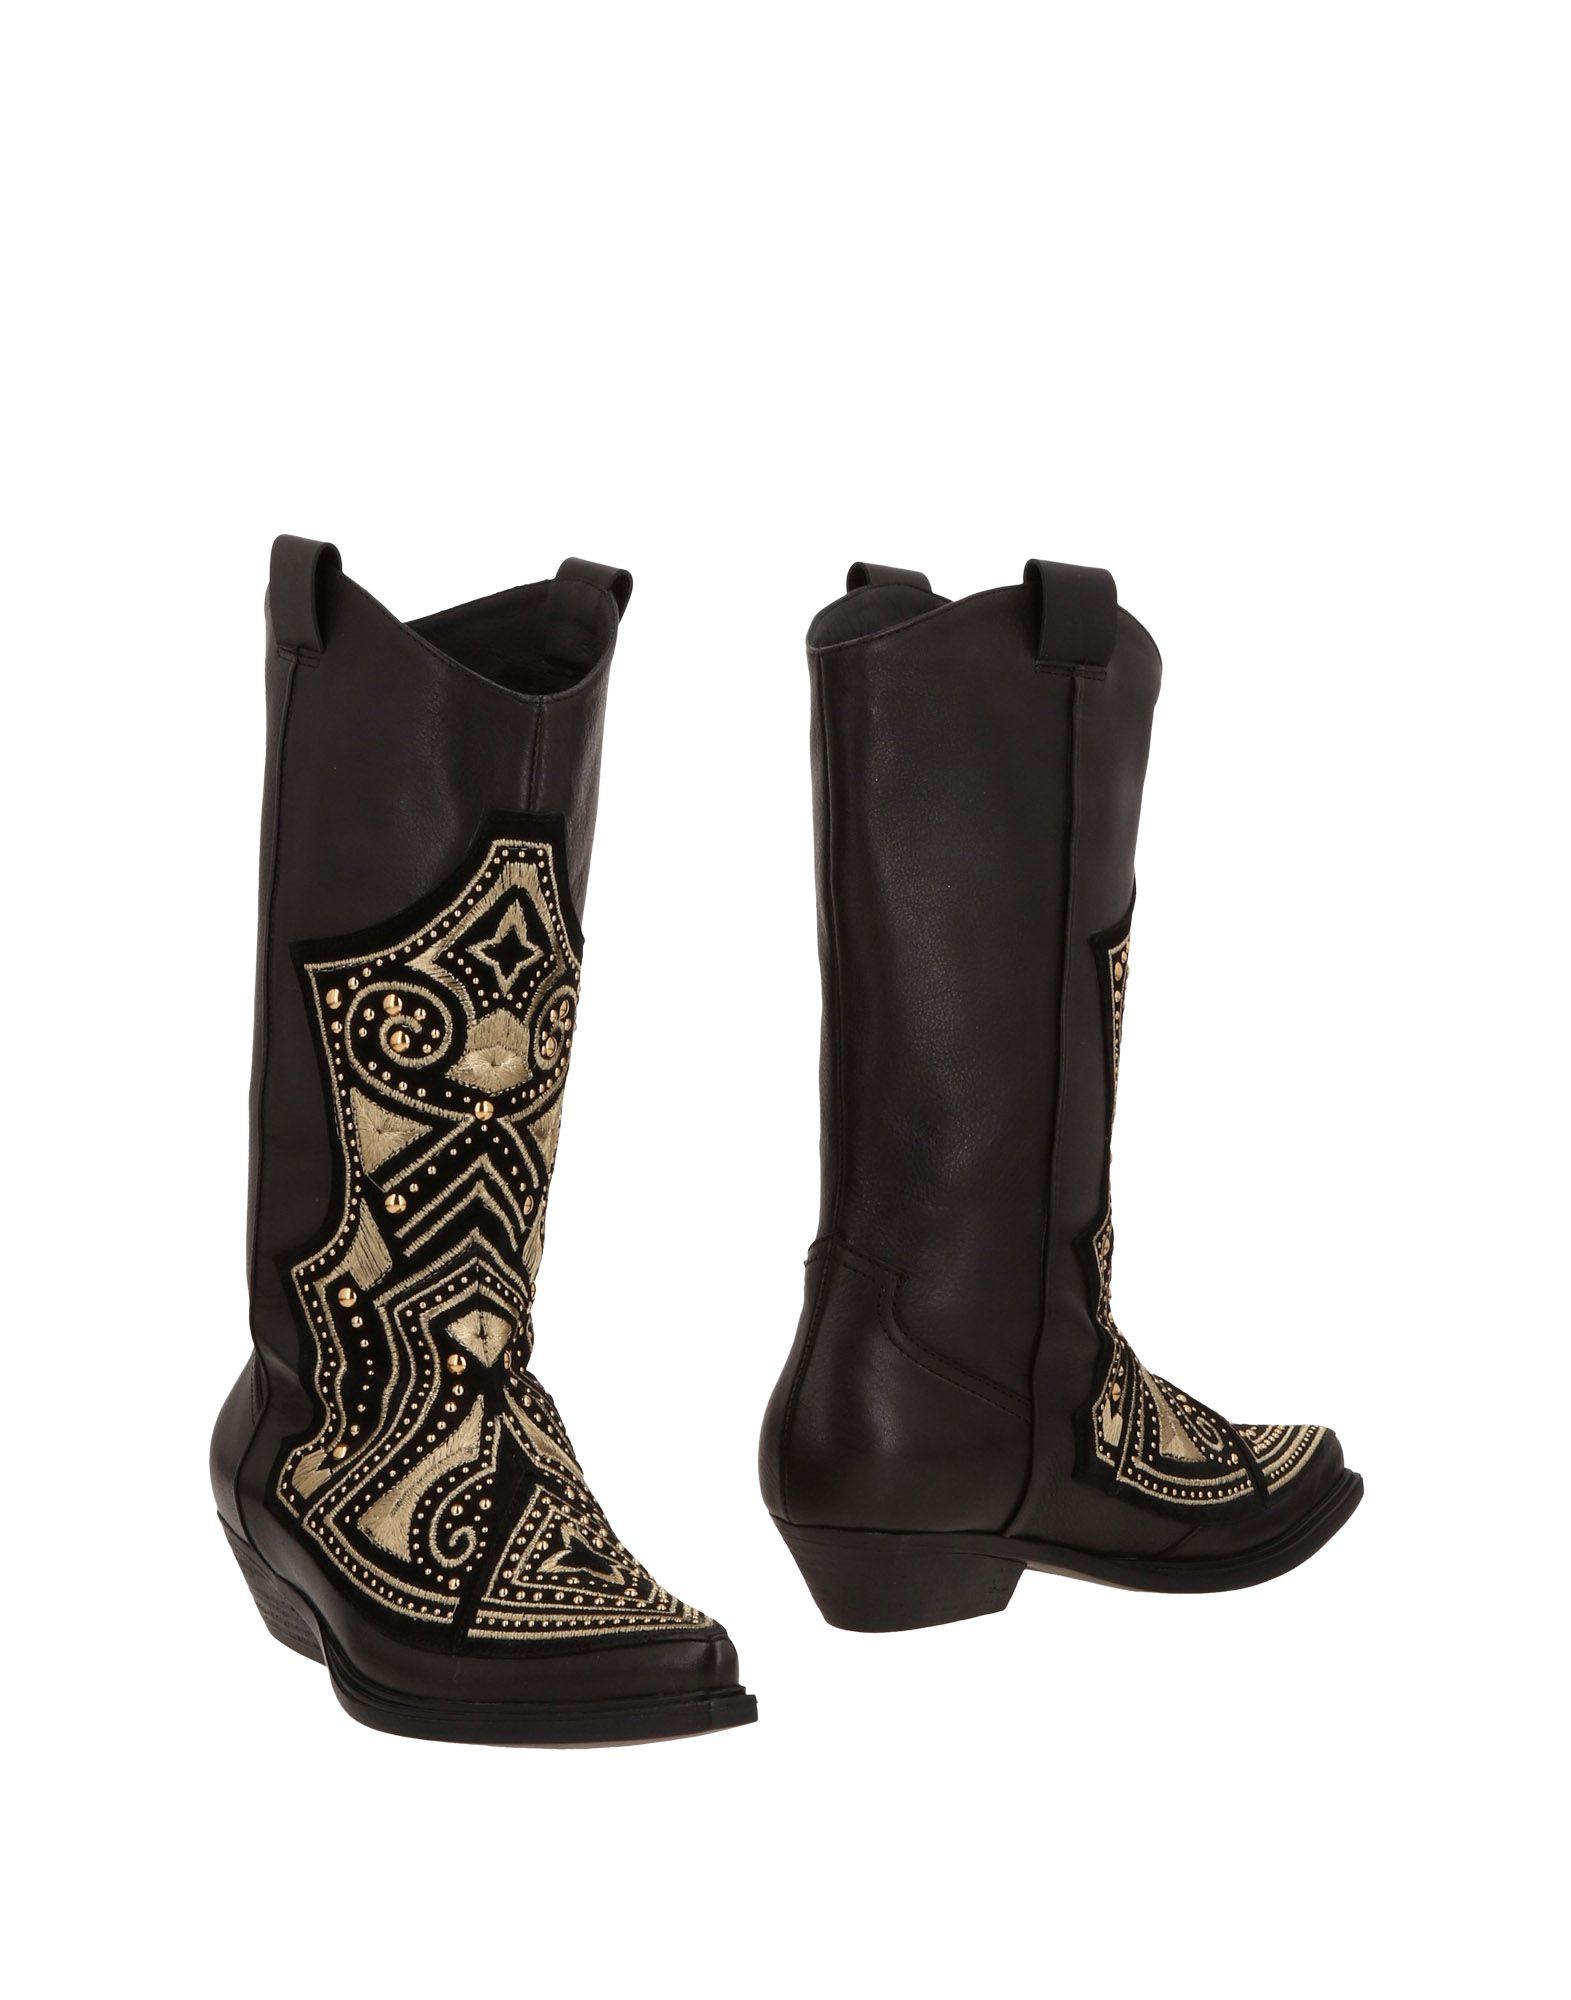 Rabatt Schuhe Vic Matiē Stiefel Stiefel Stiefel Damen  11459456TJ 504e5a